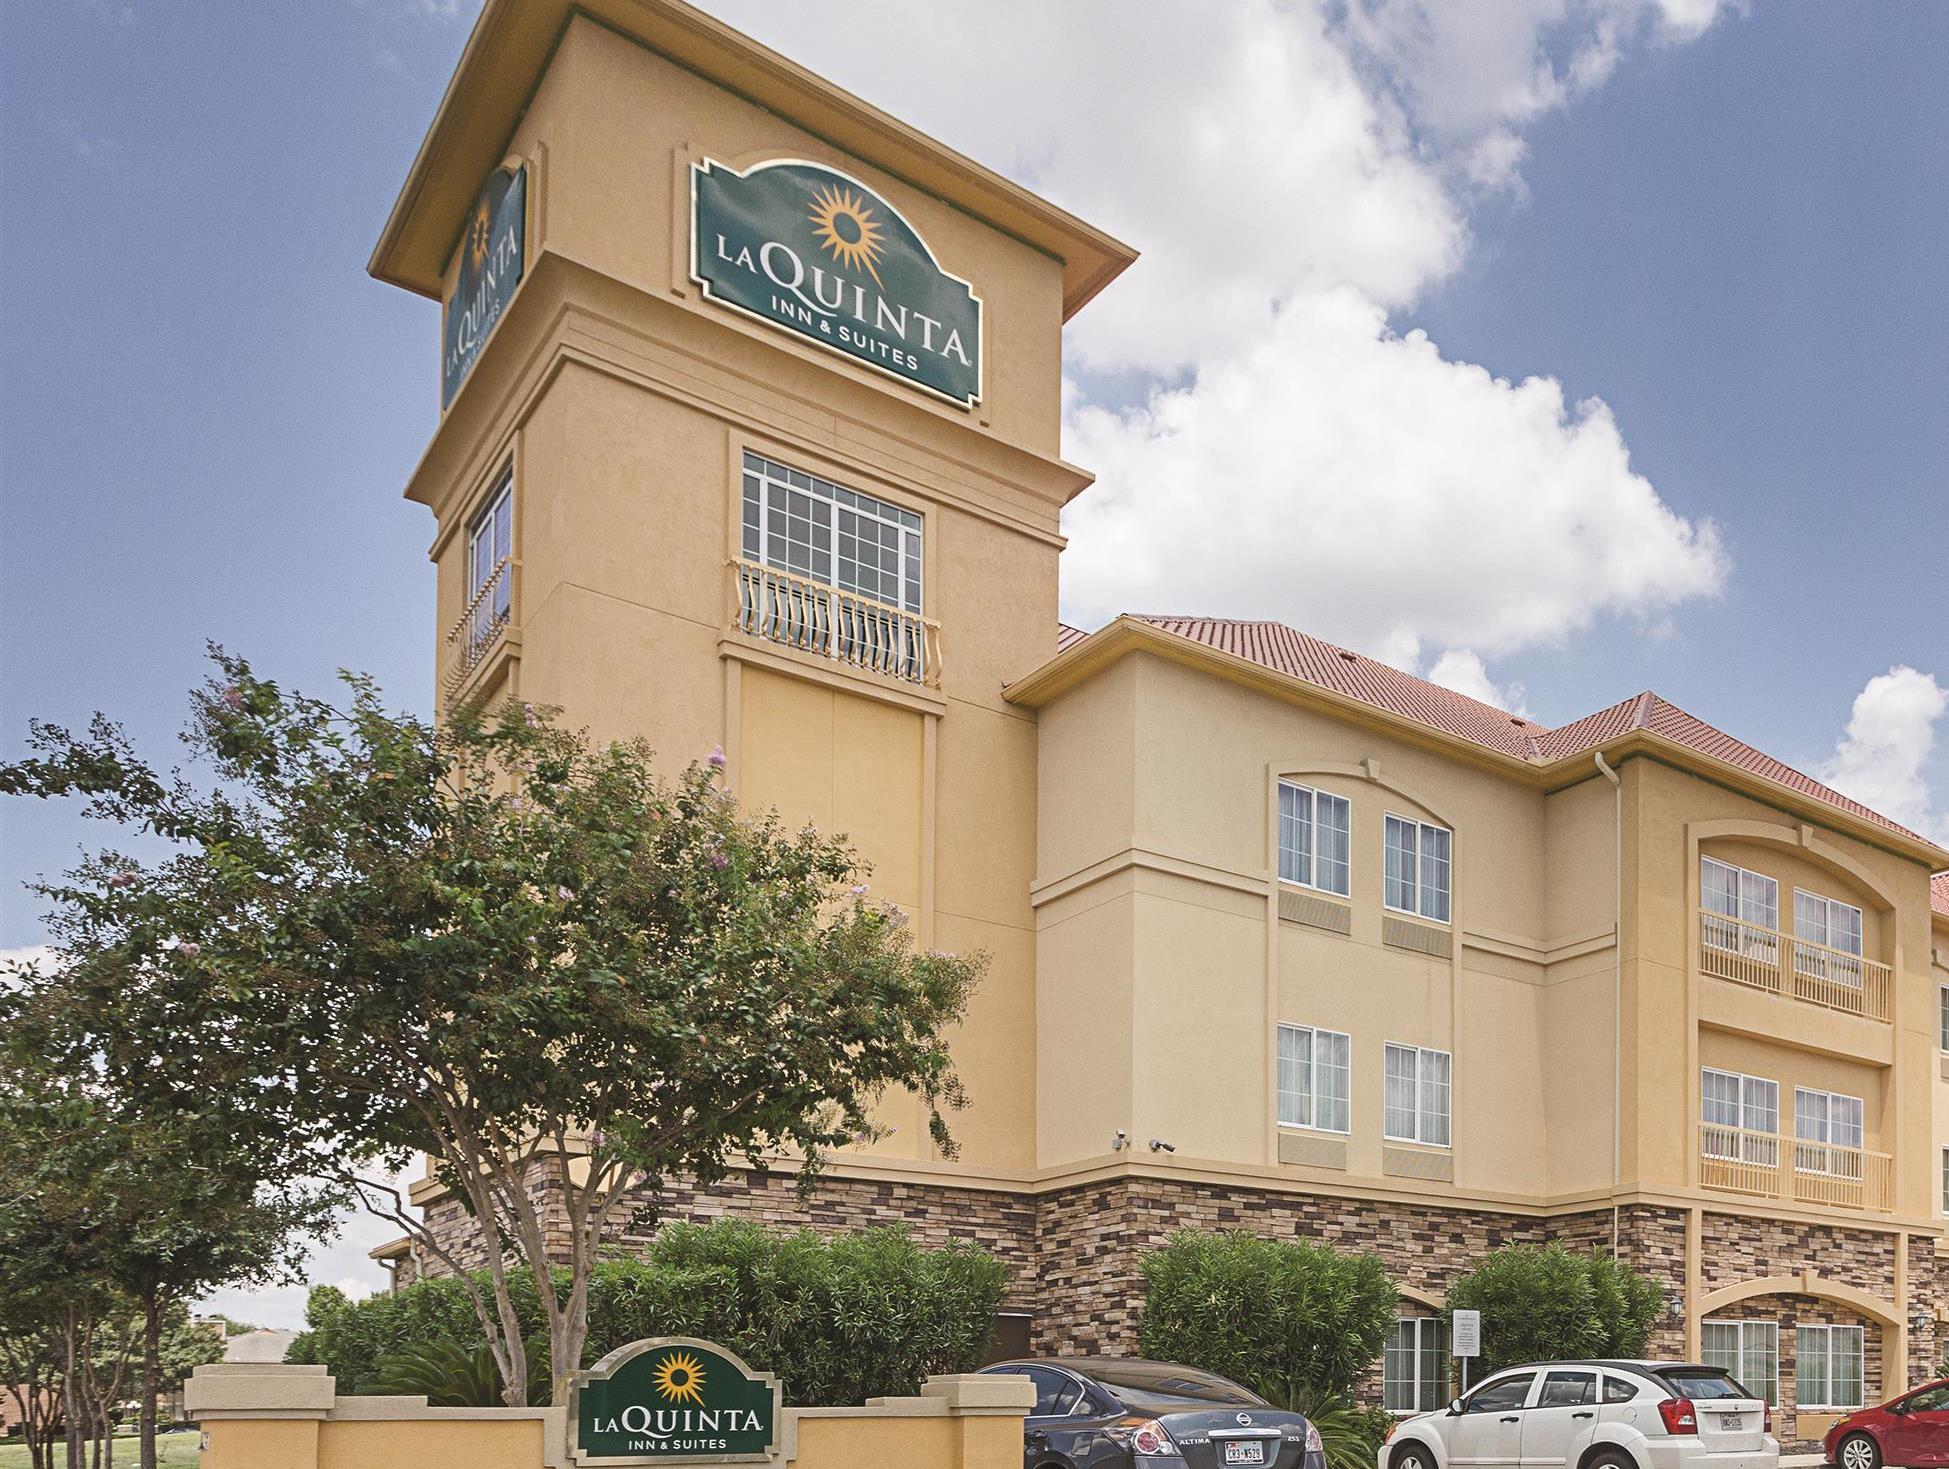 La Quinta Inn And Suites By Wyndham Houston Energy Corridor